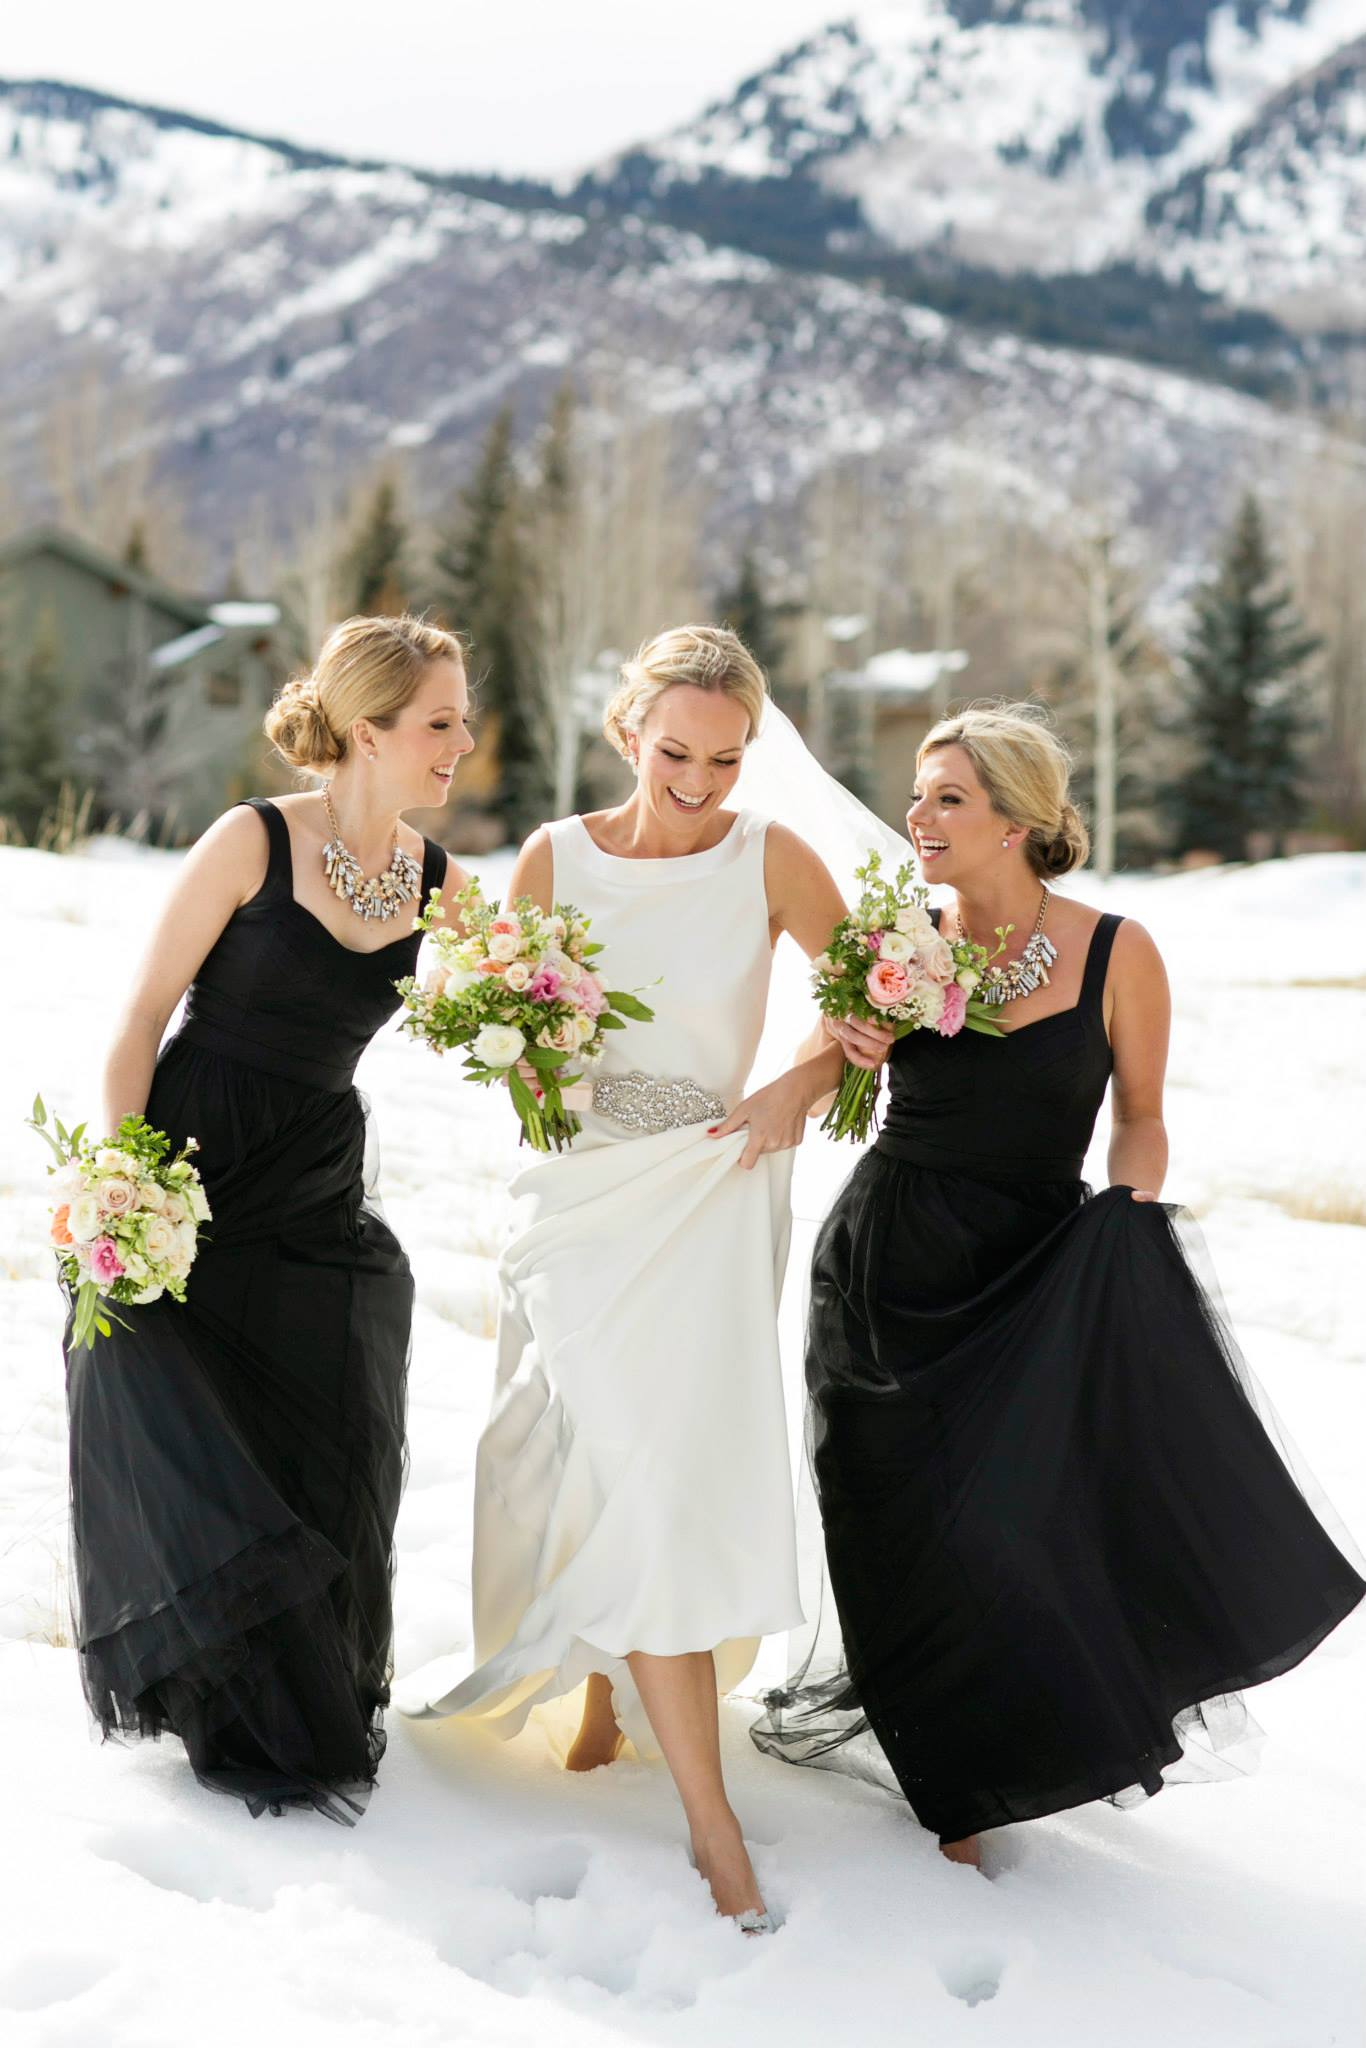 Amelia-Park-City-winter-wedding-photo-Lauren-Michelle-Weddings-006.jpg